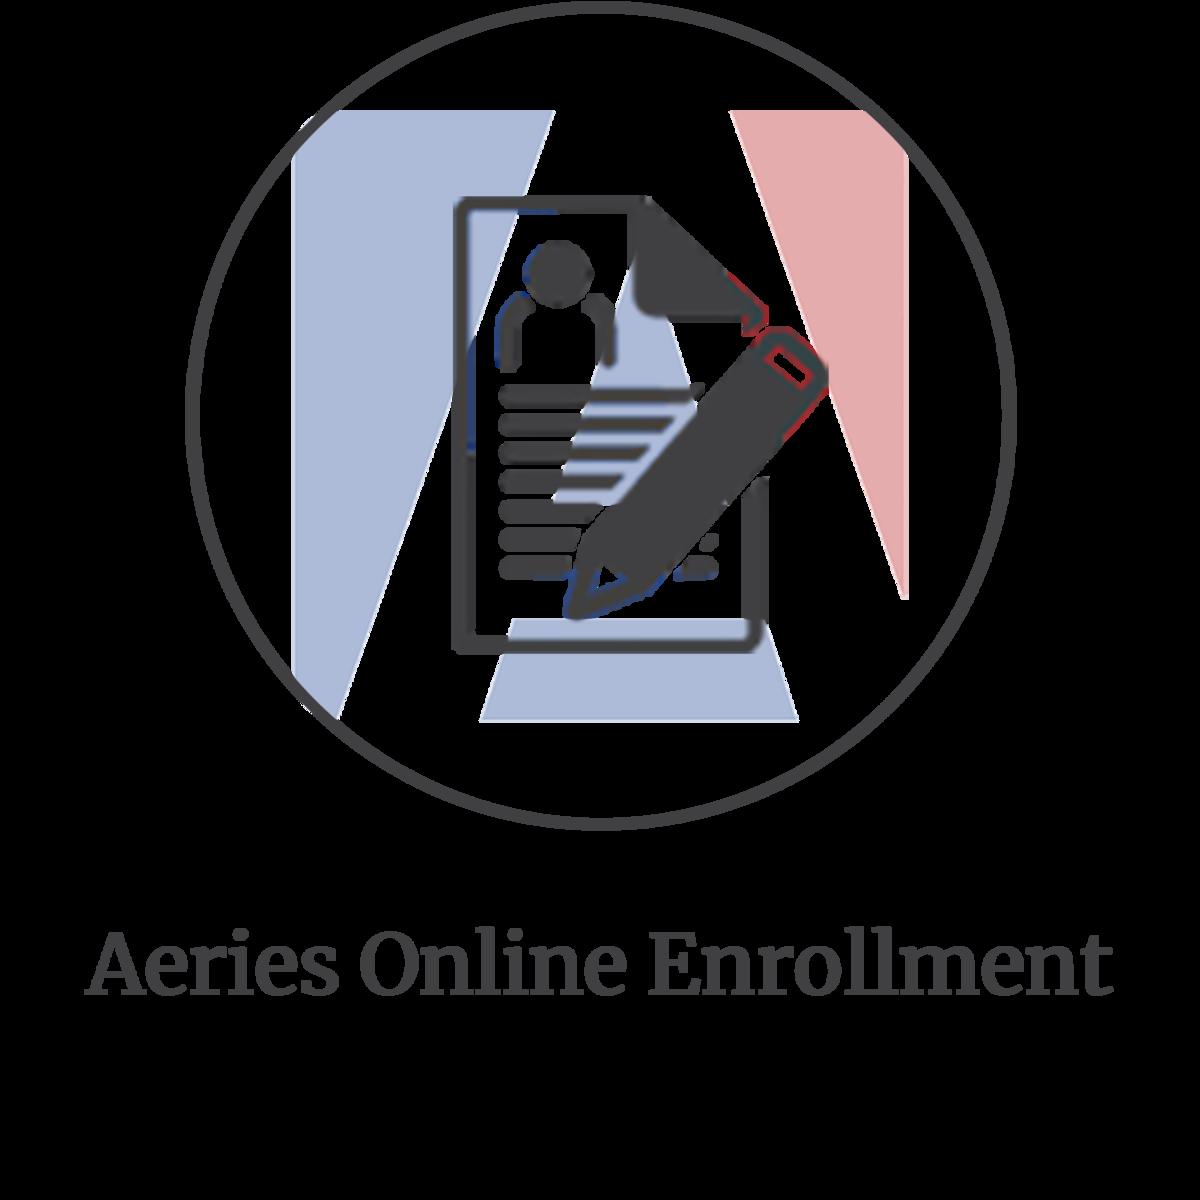 Aeries Online Enrollment